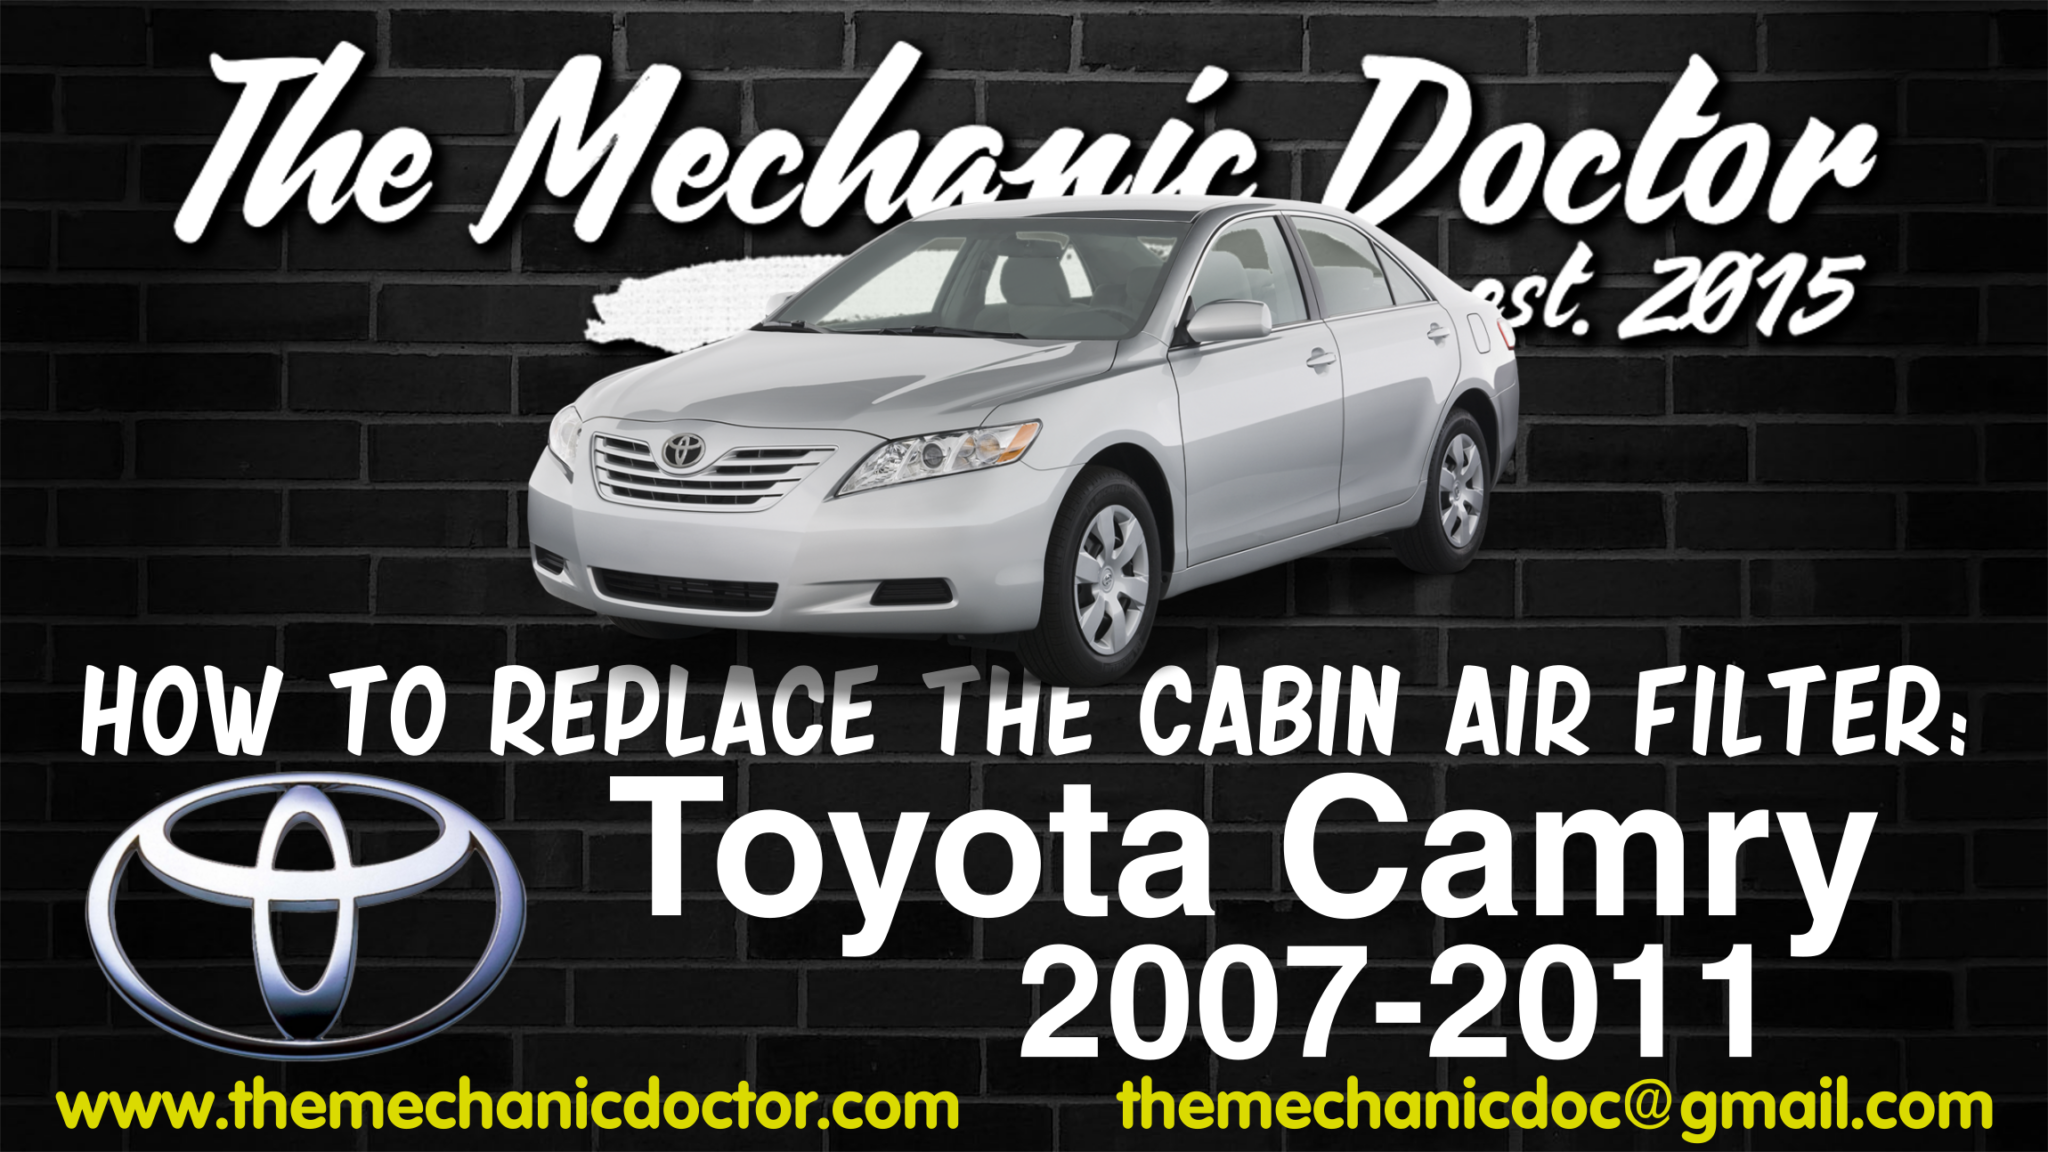 5b224a6abd5399f2a9eeae8c201c437e Amazing toyota Camry 2006 Cabin Air Filter Cars Trend